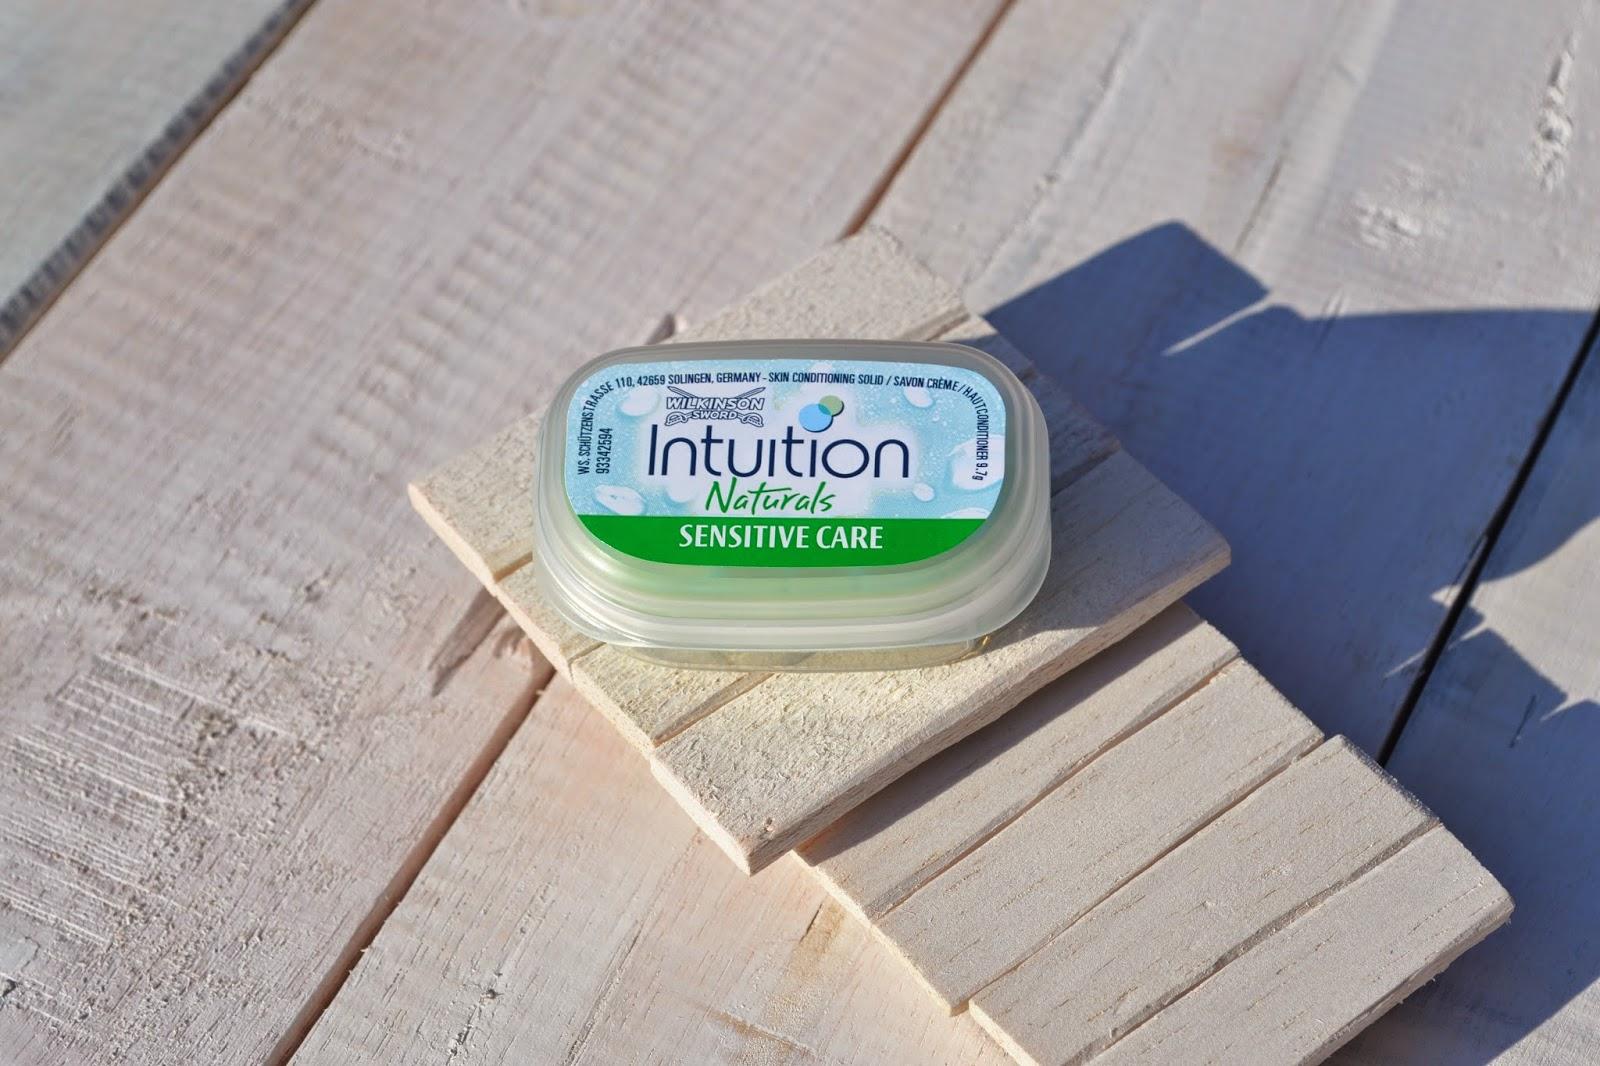 Wilkinson Sword Intuition